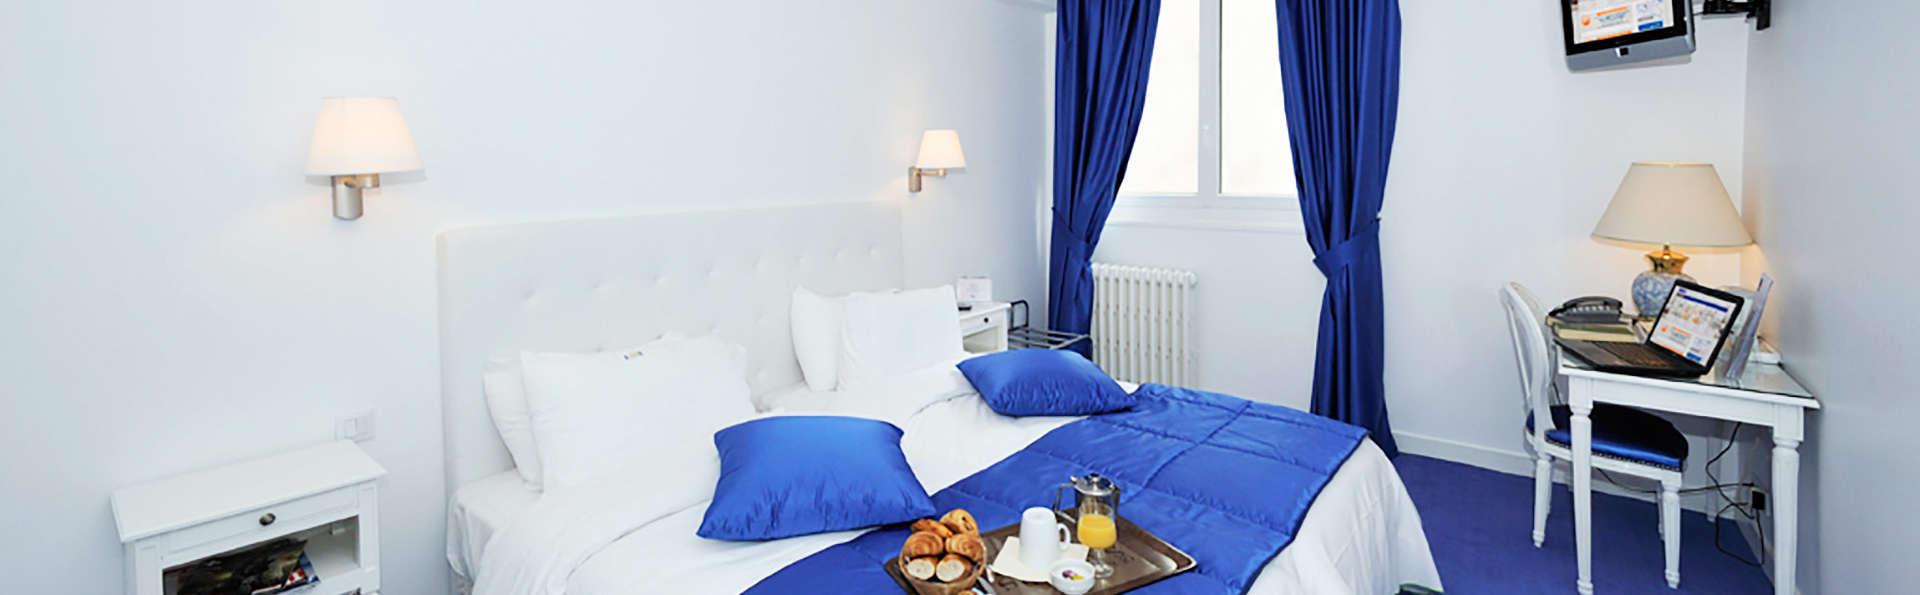 Hôtel Kyriad Saumur - EDIT_room3.jpg